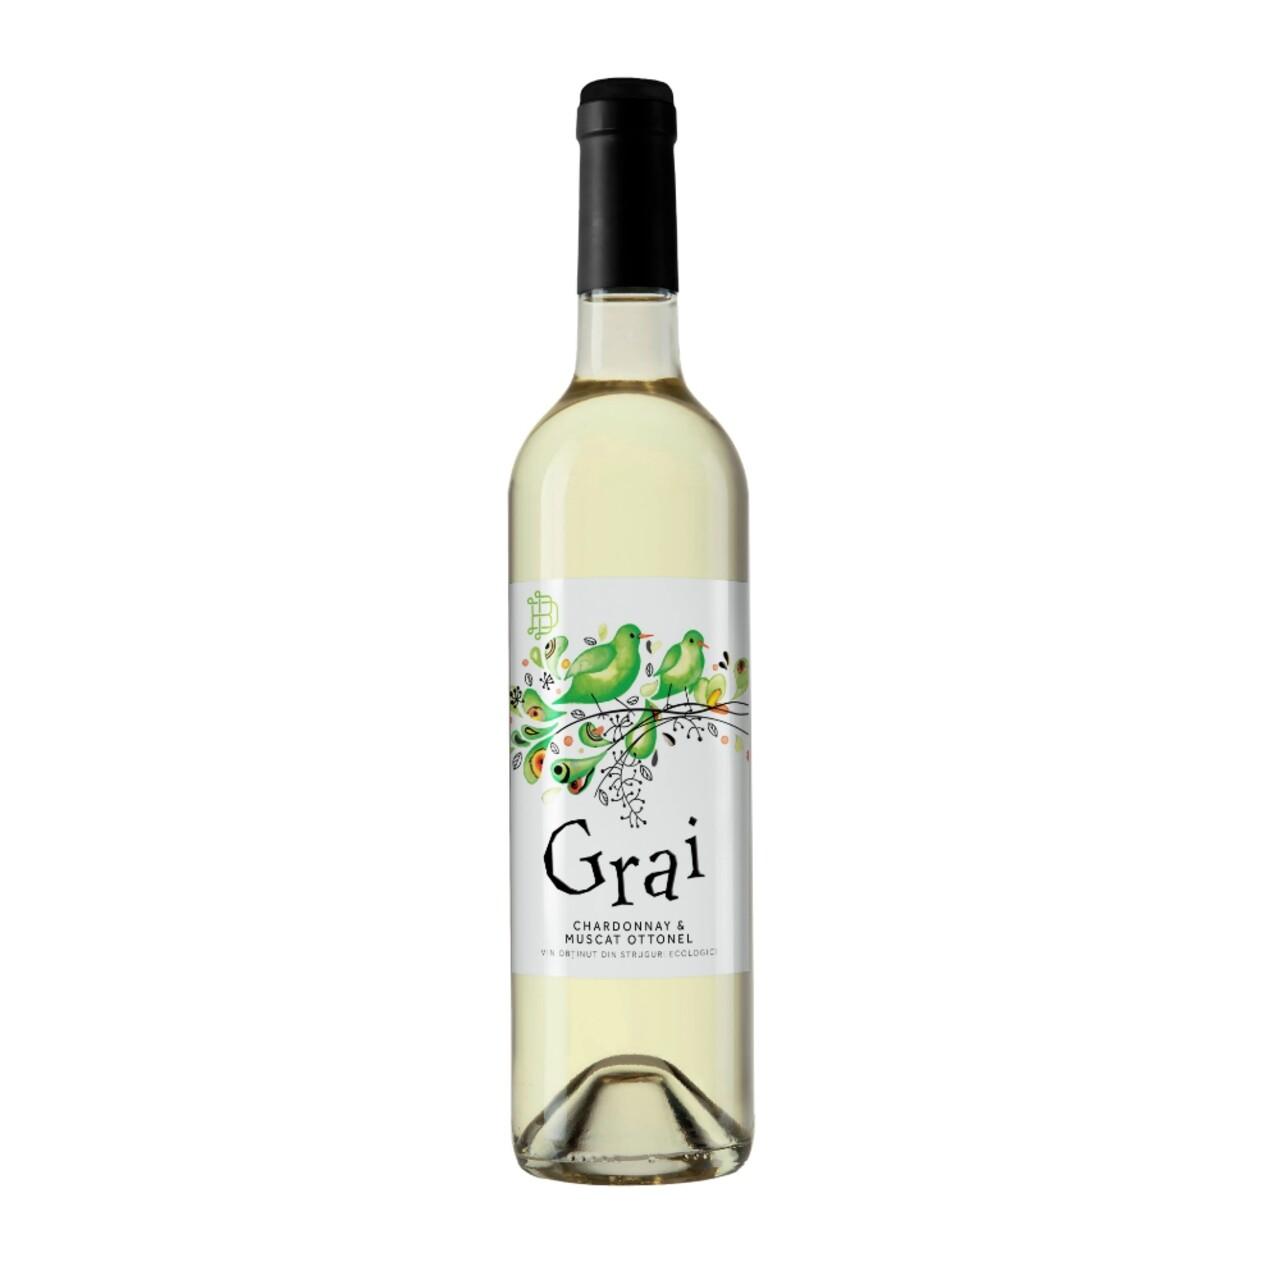 Domeniul Bogdan Grai Chardonnay, Muscat Ottonel